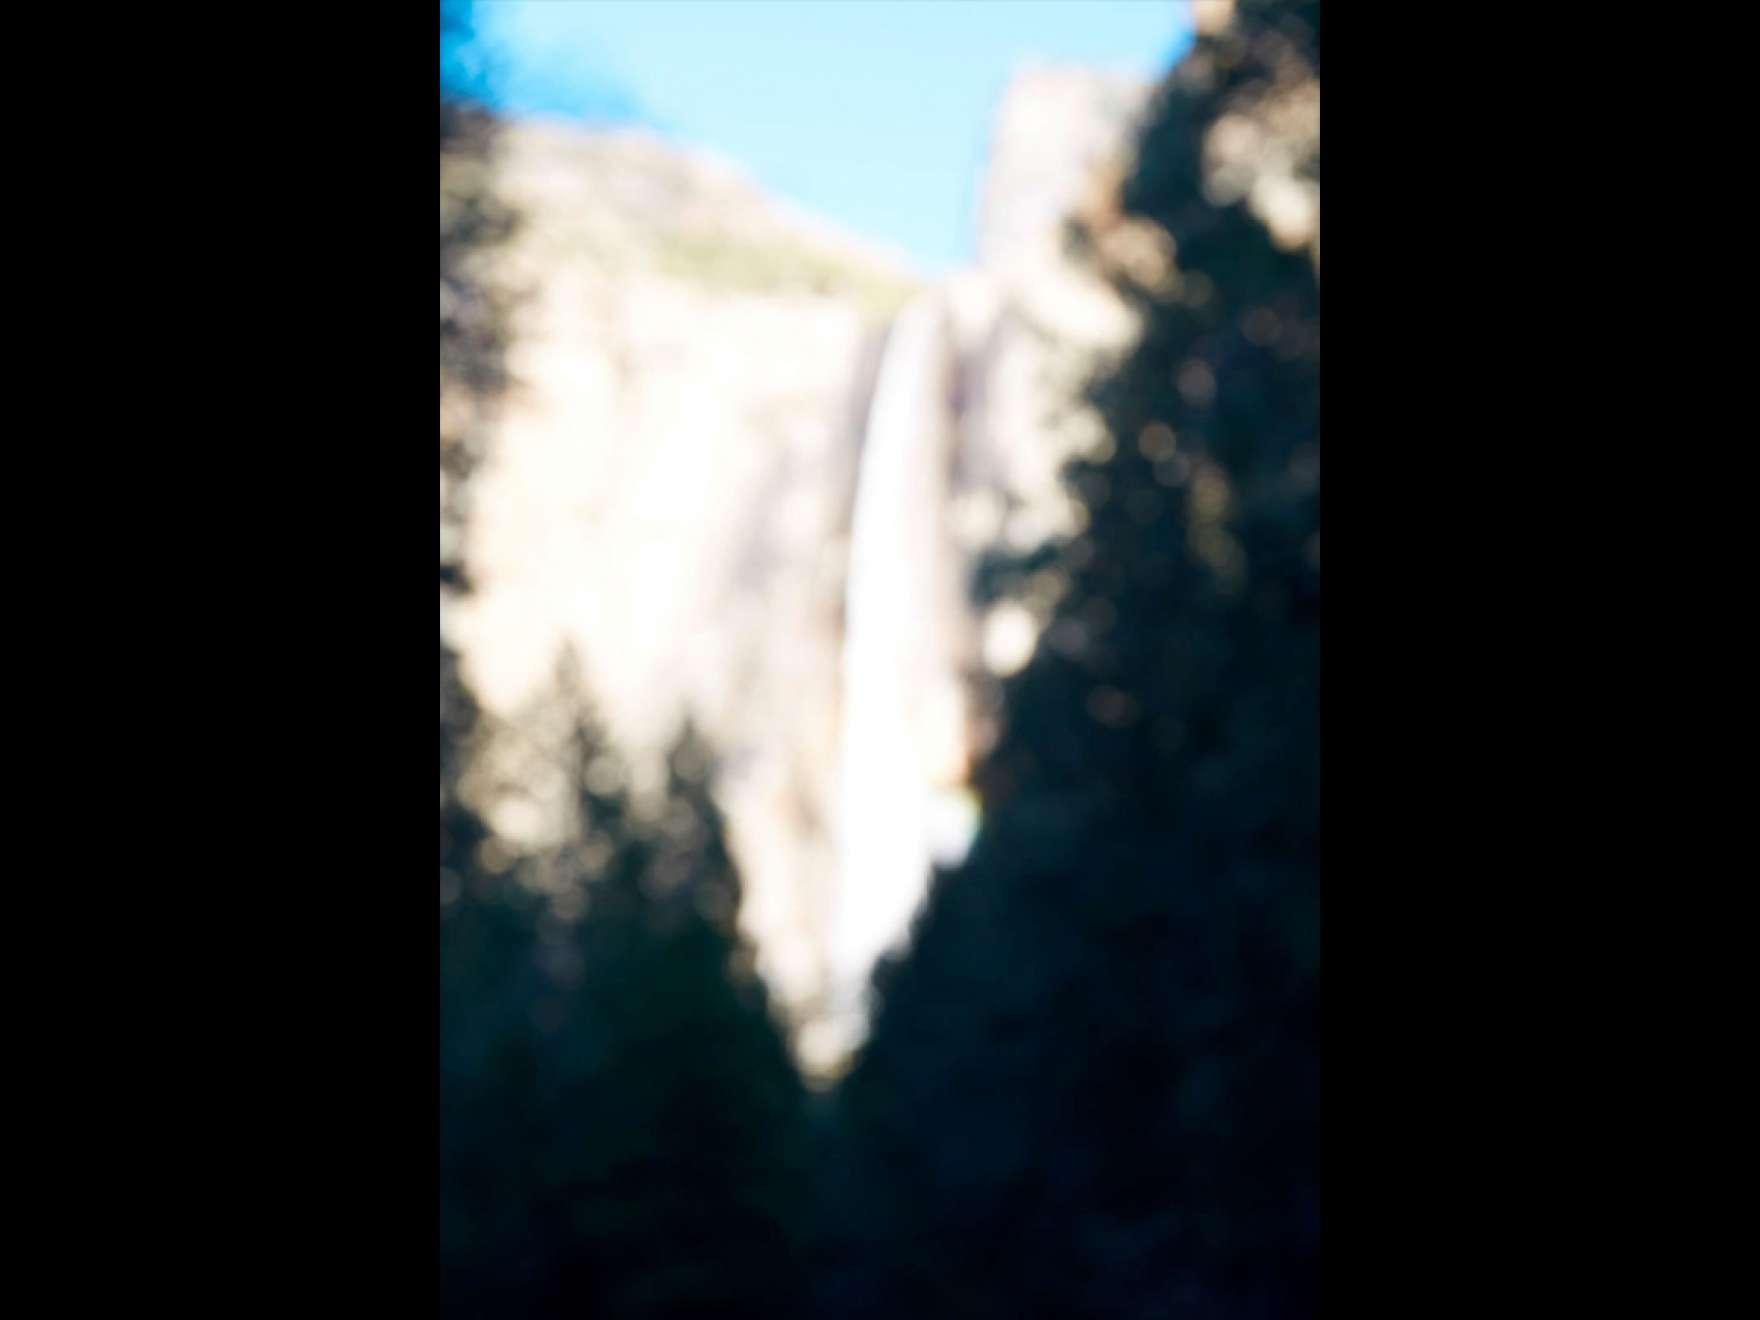 Catherine Opie's photograph, Untitled #1 (Yosemite Valley), 2015